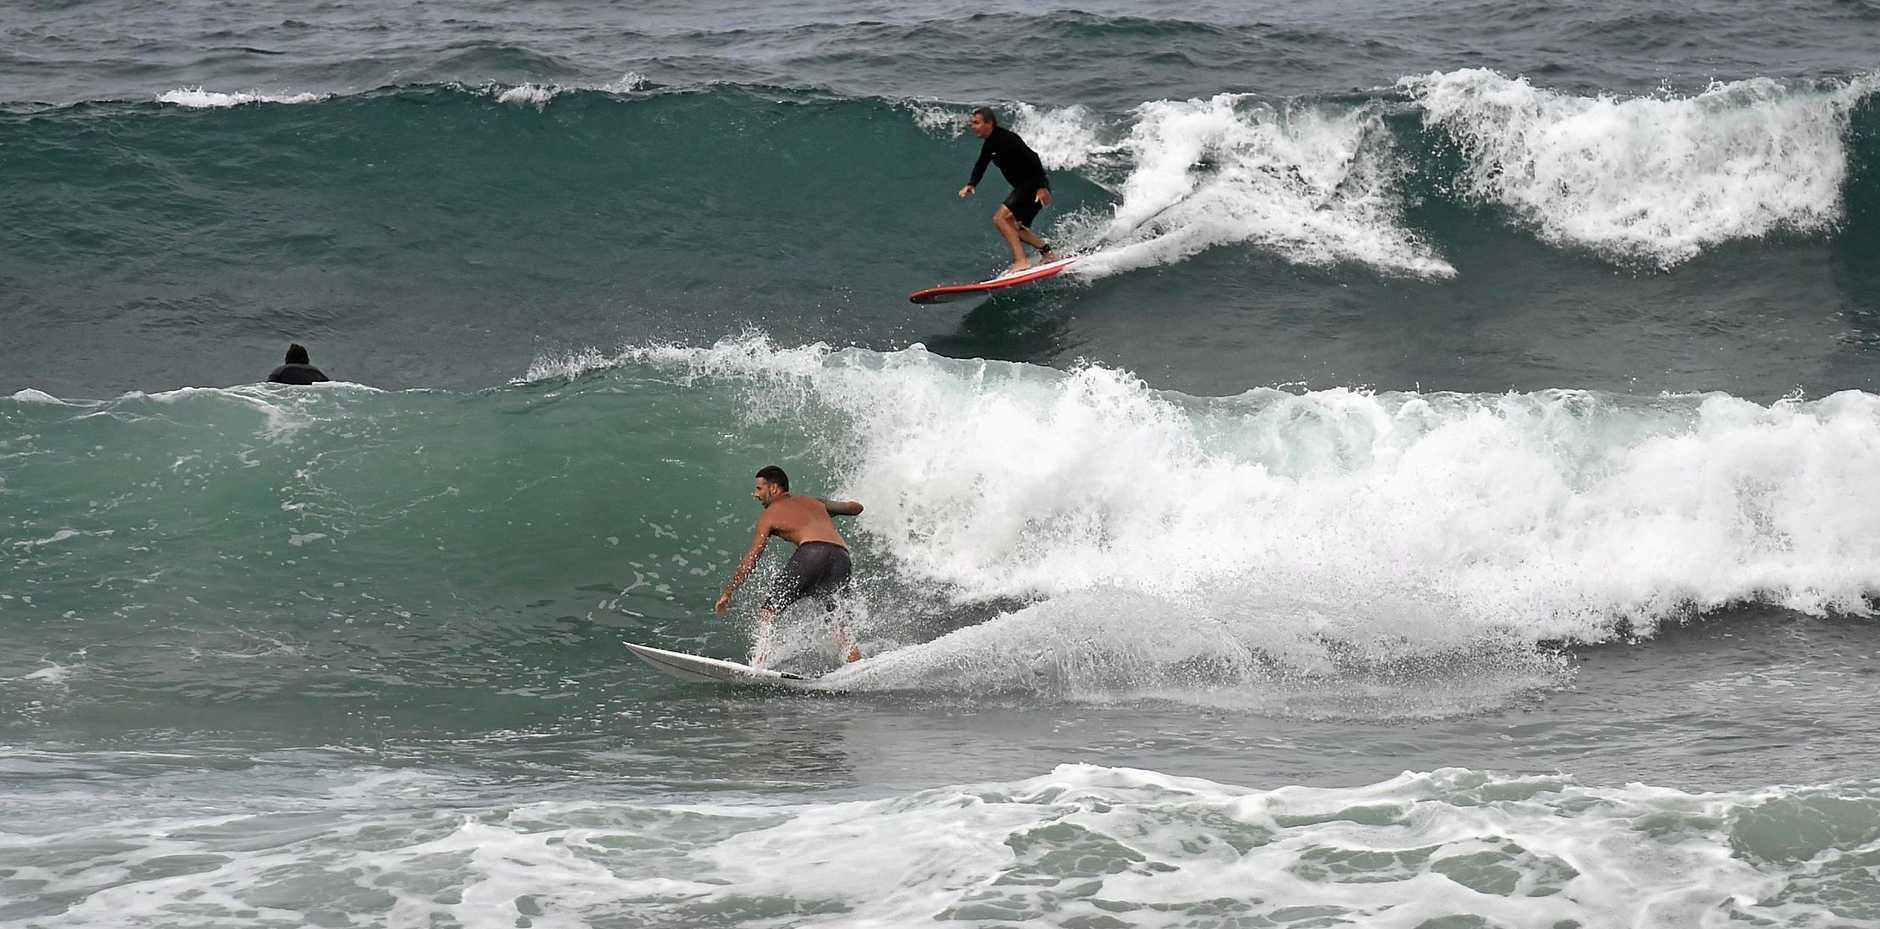 There were plenty of waves to go around at Alexandra Headland today.